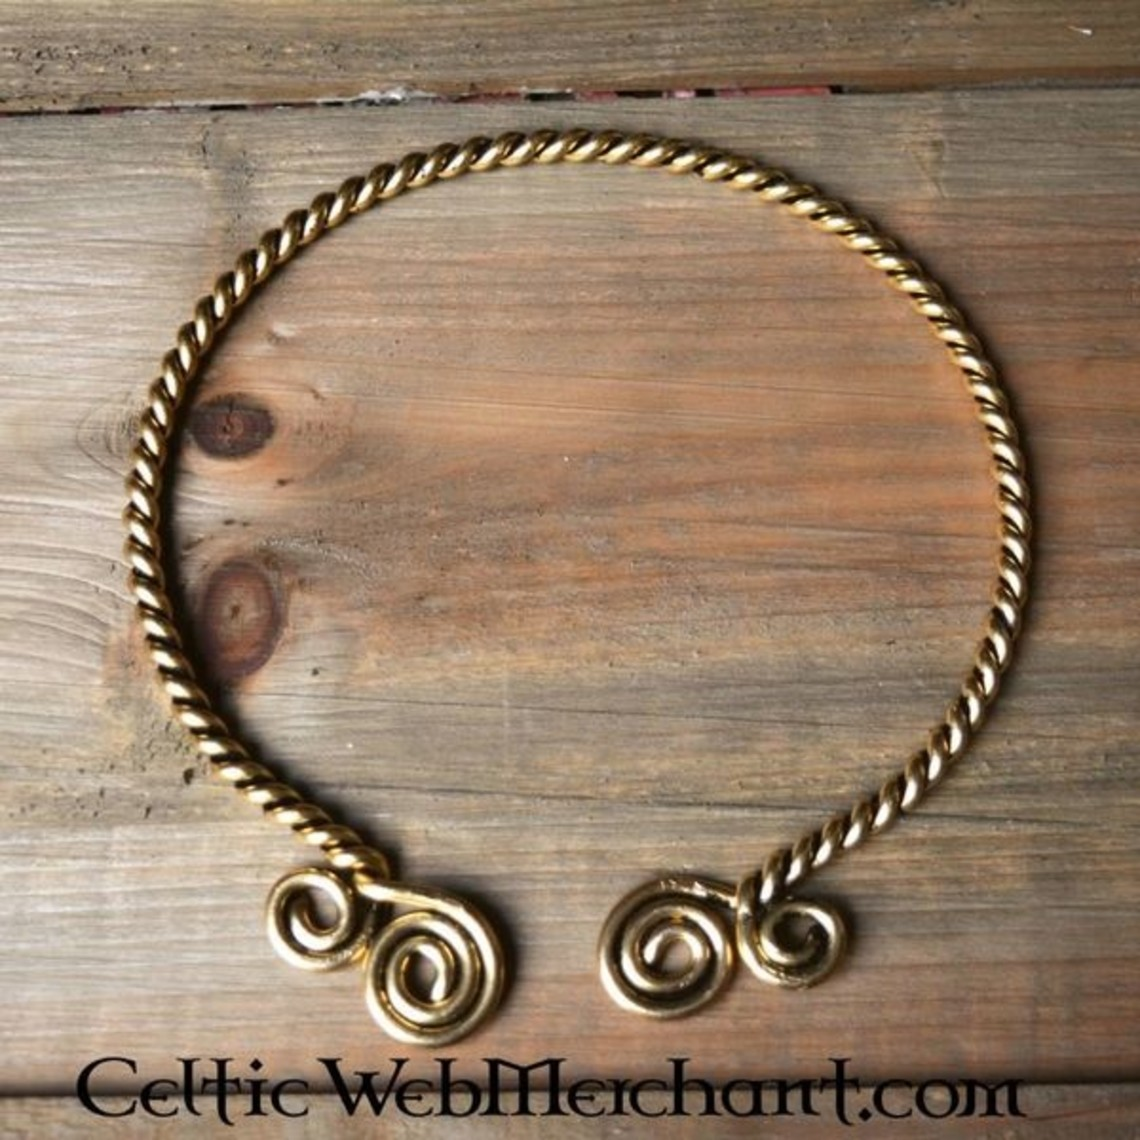 Drehmoment mit keltischen Spiralen, versilbert